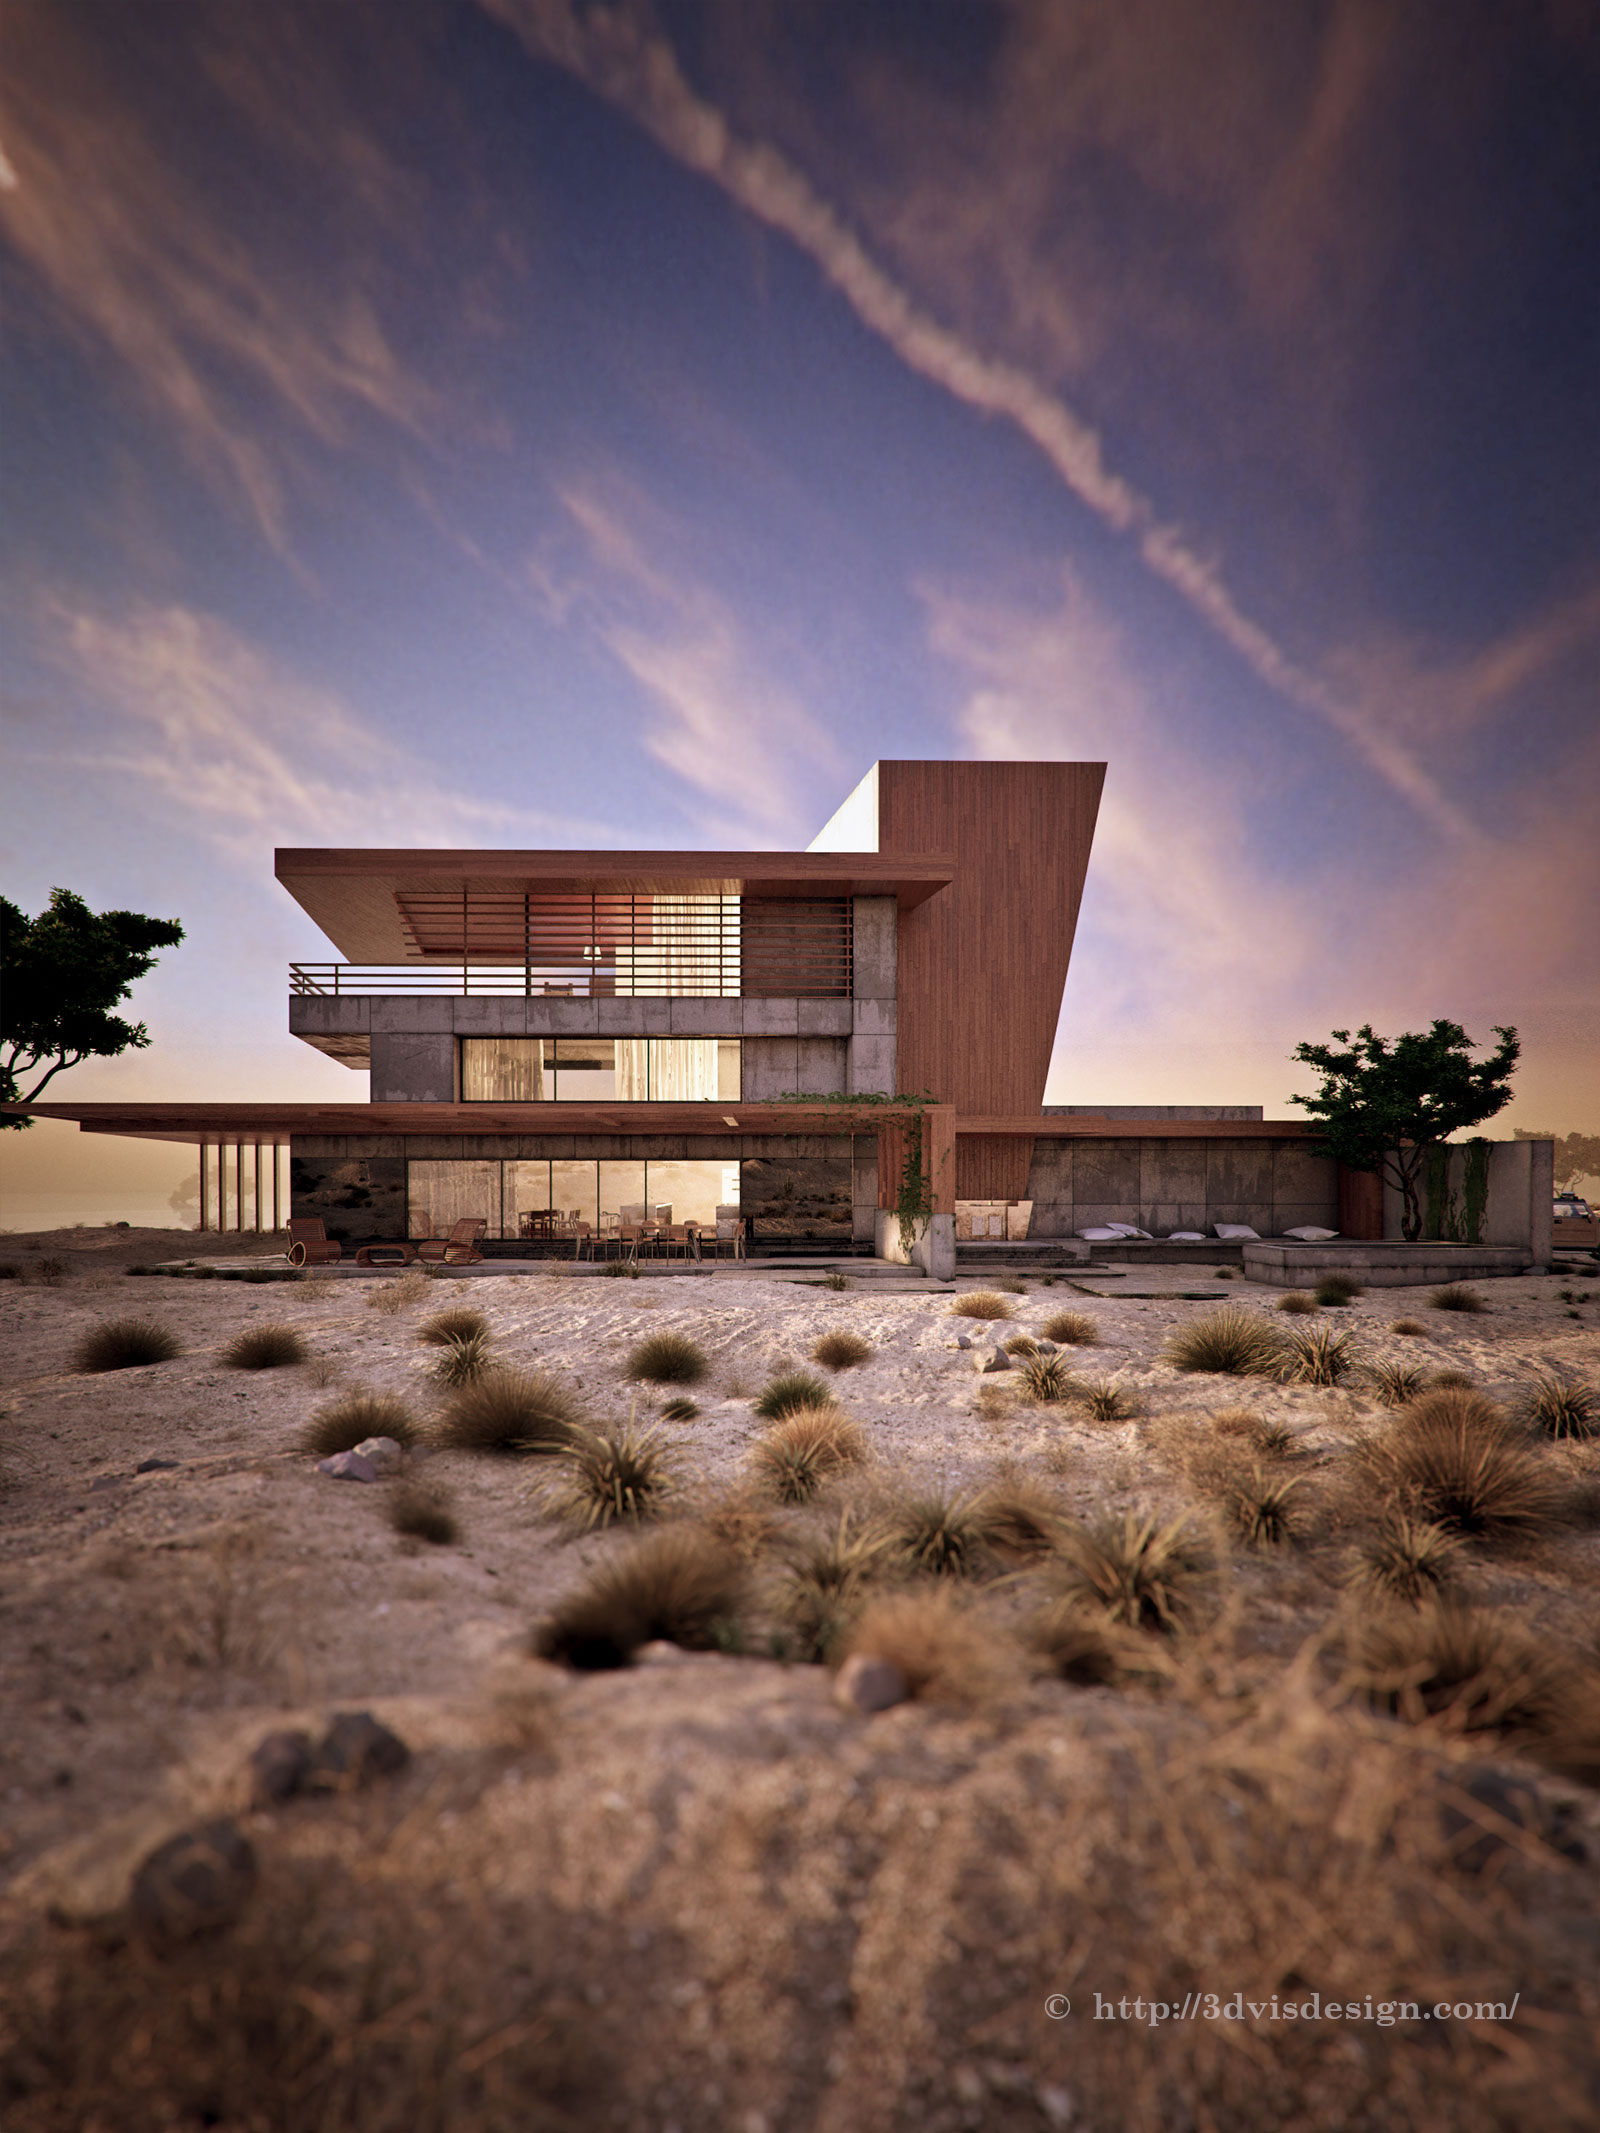 Architectural rendering exterior